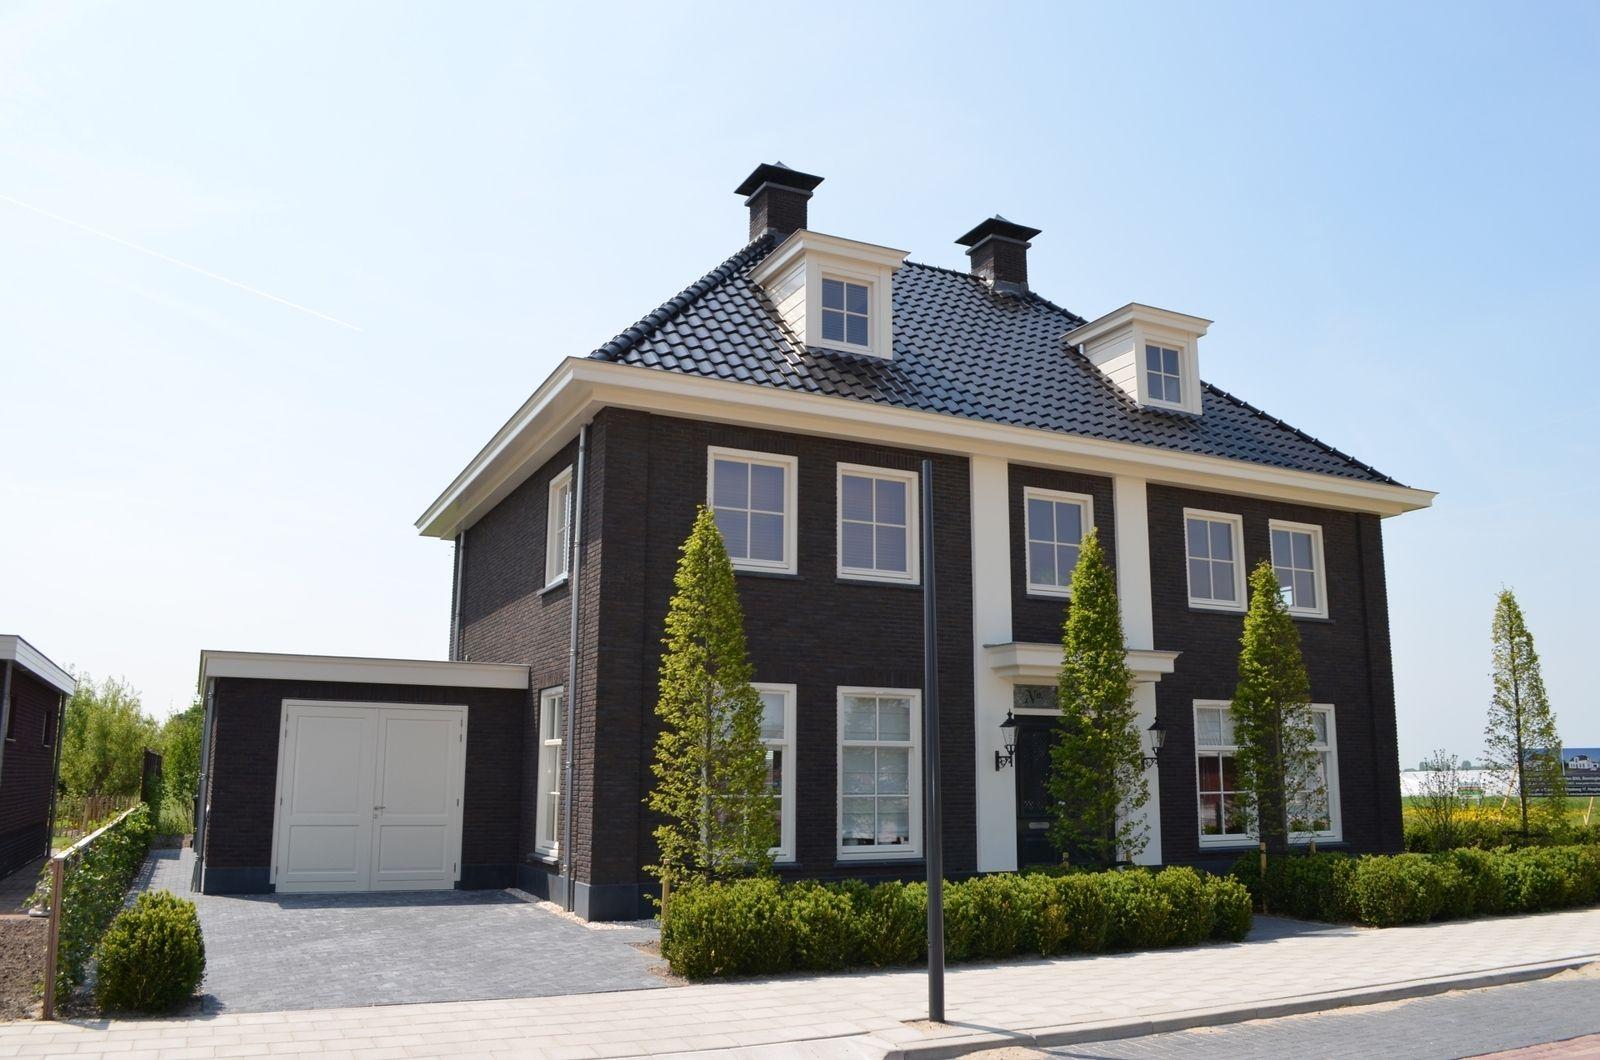 Riant herenhuis met garage dreamhouse house design house en